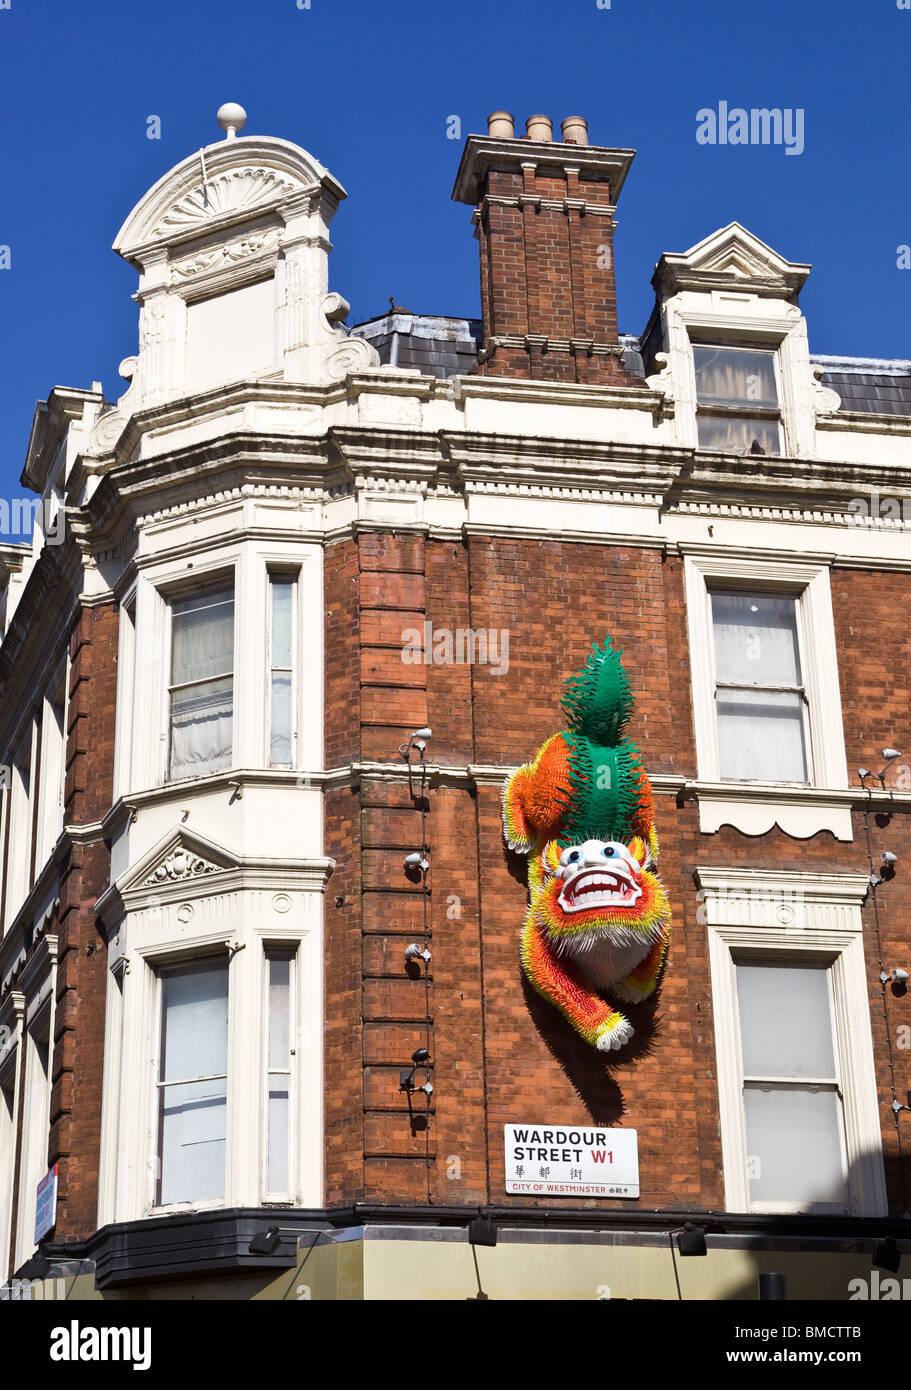 Wardour Street with Chinese Dragon London England UK - Stock Image